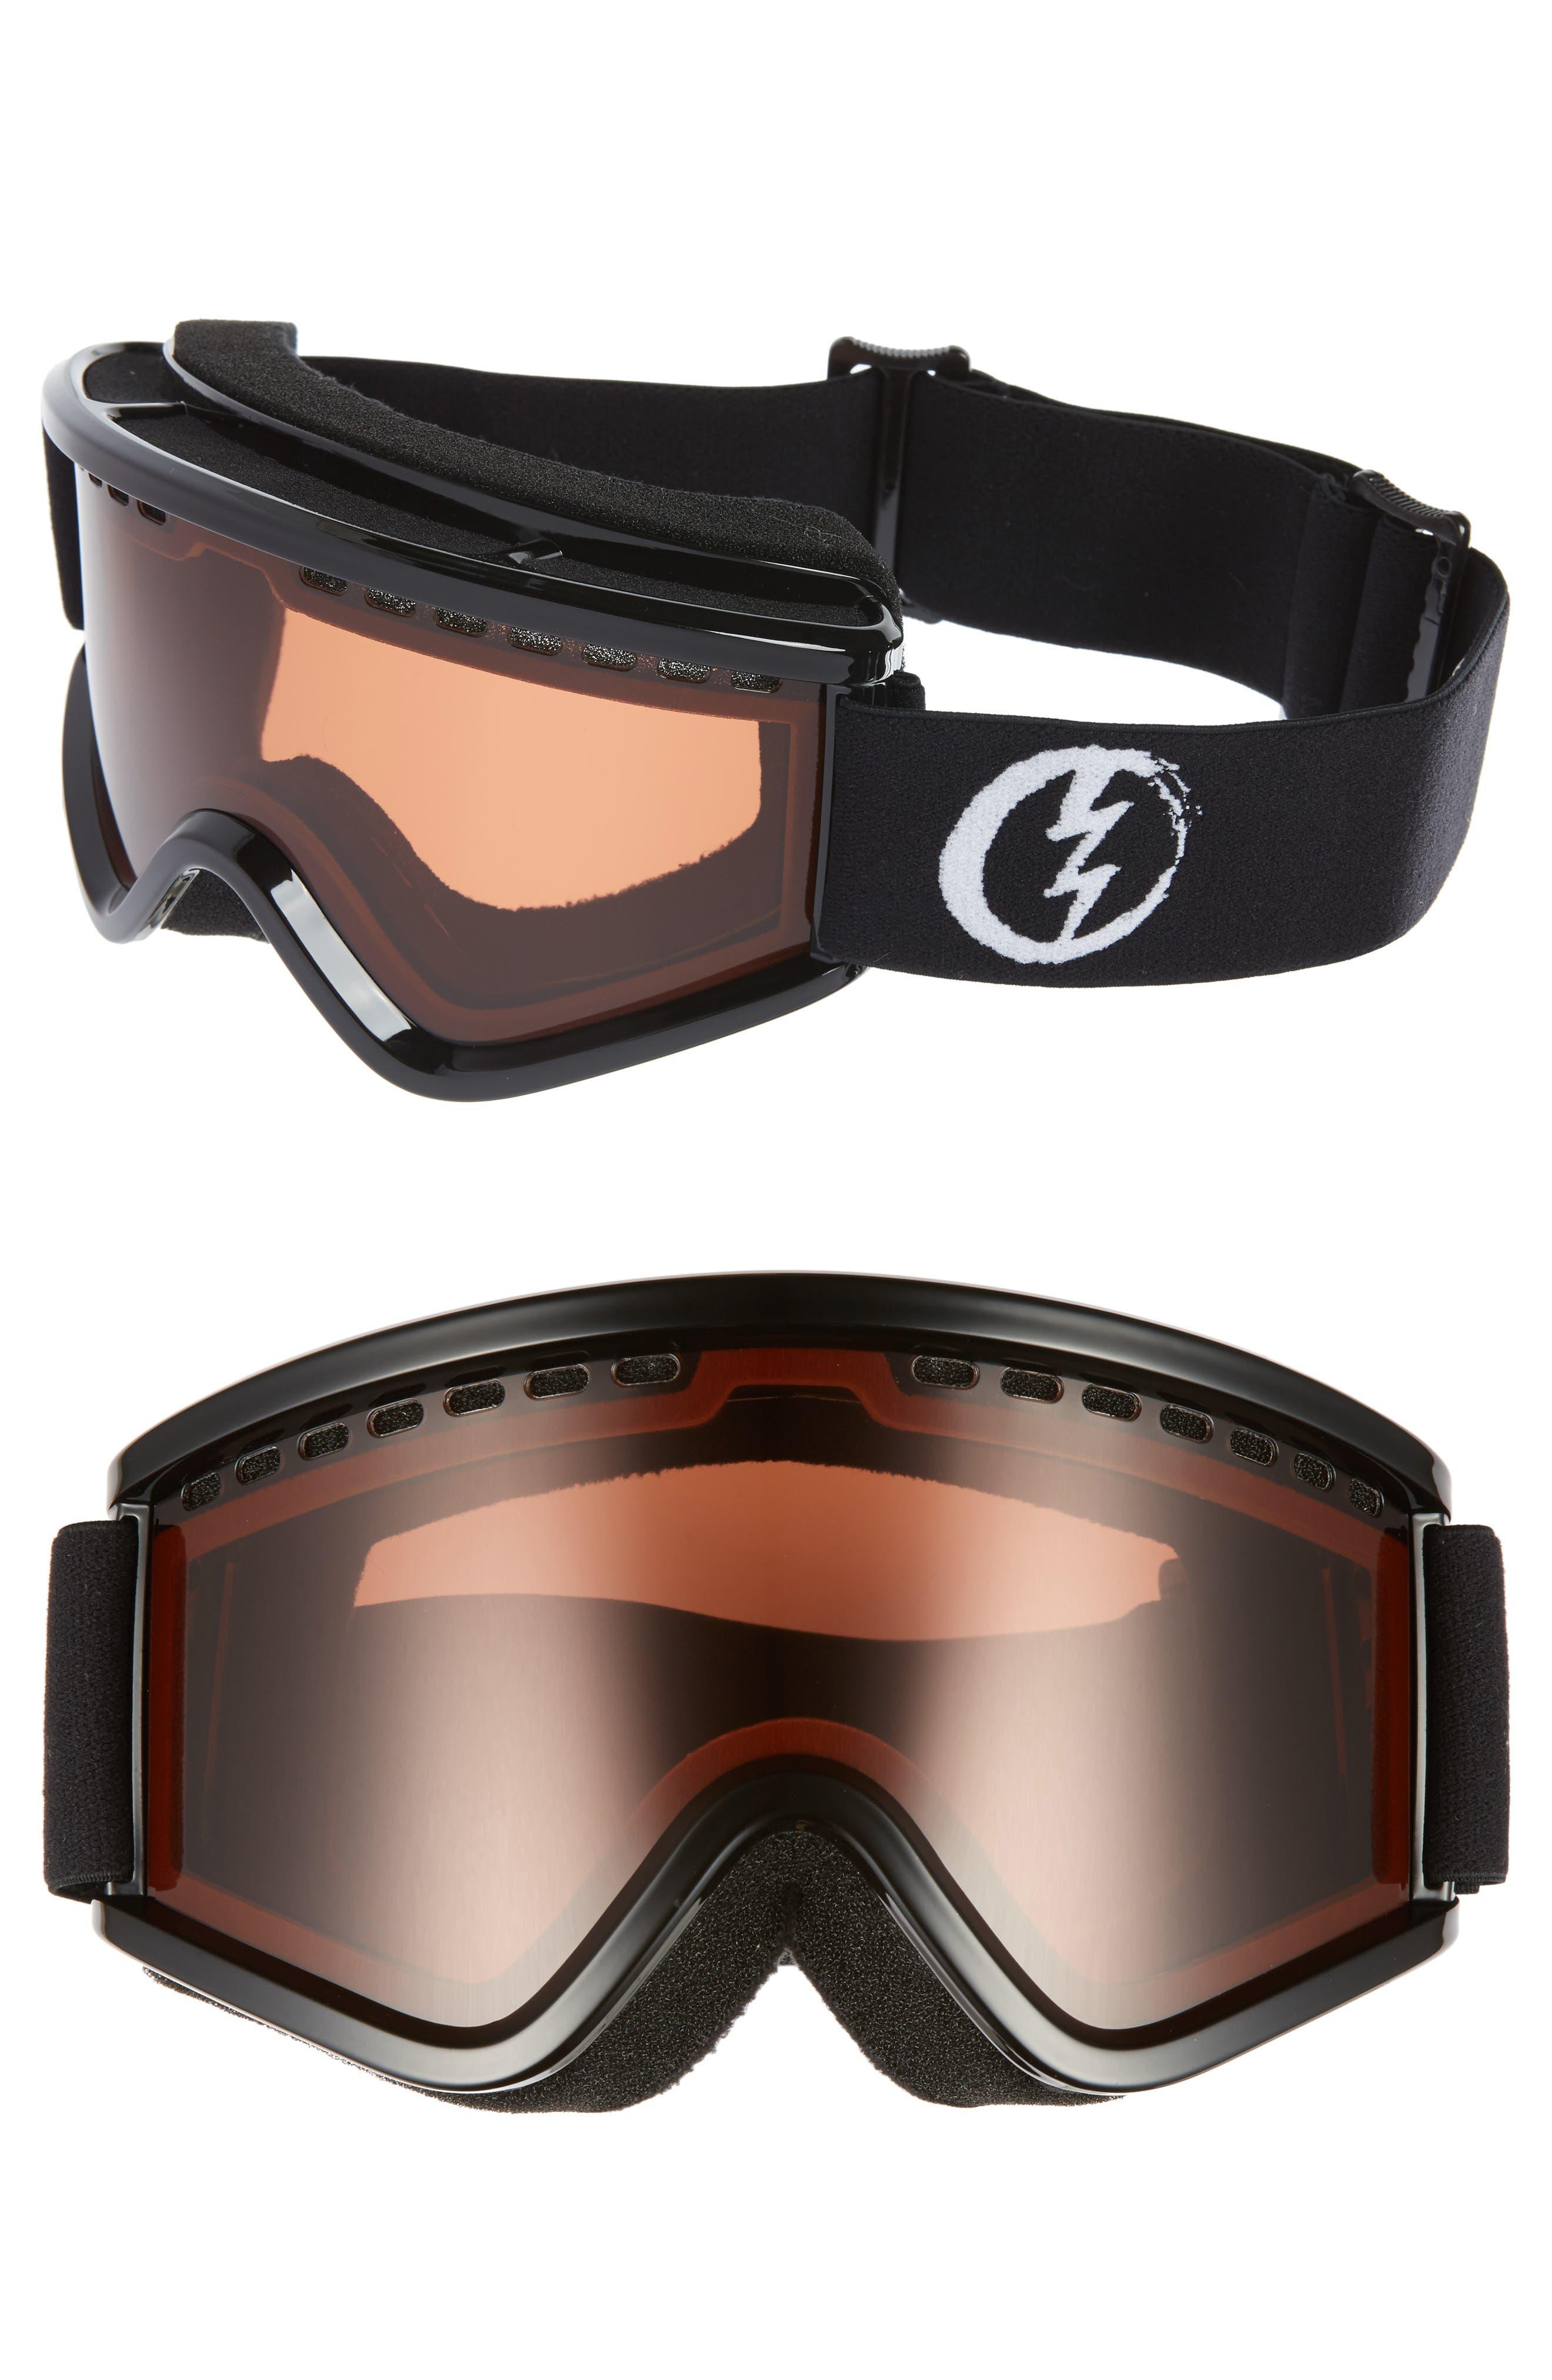 Alternate Image 1 Selected - ELECTRIC EGV.K Snow Goggles (Kids)